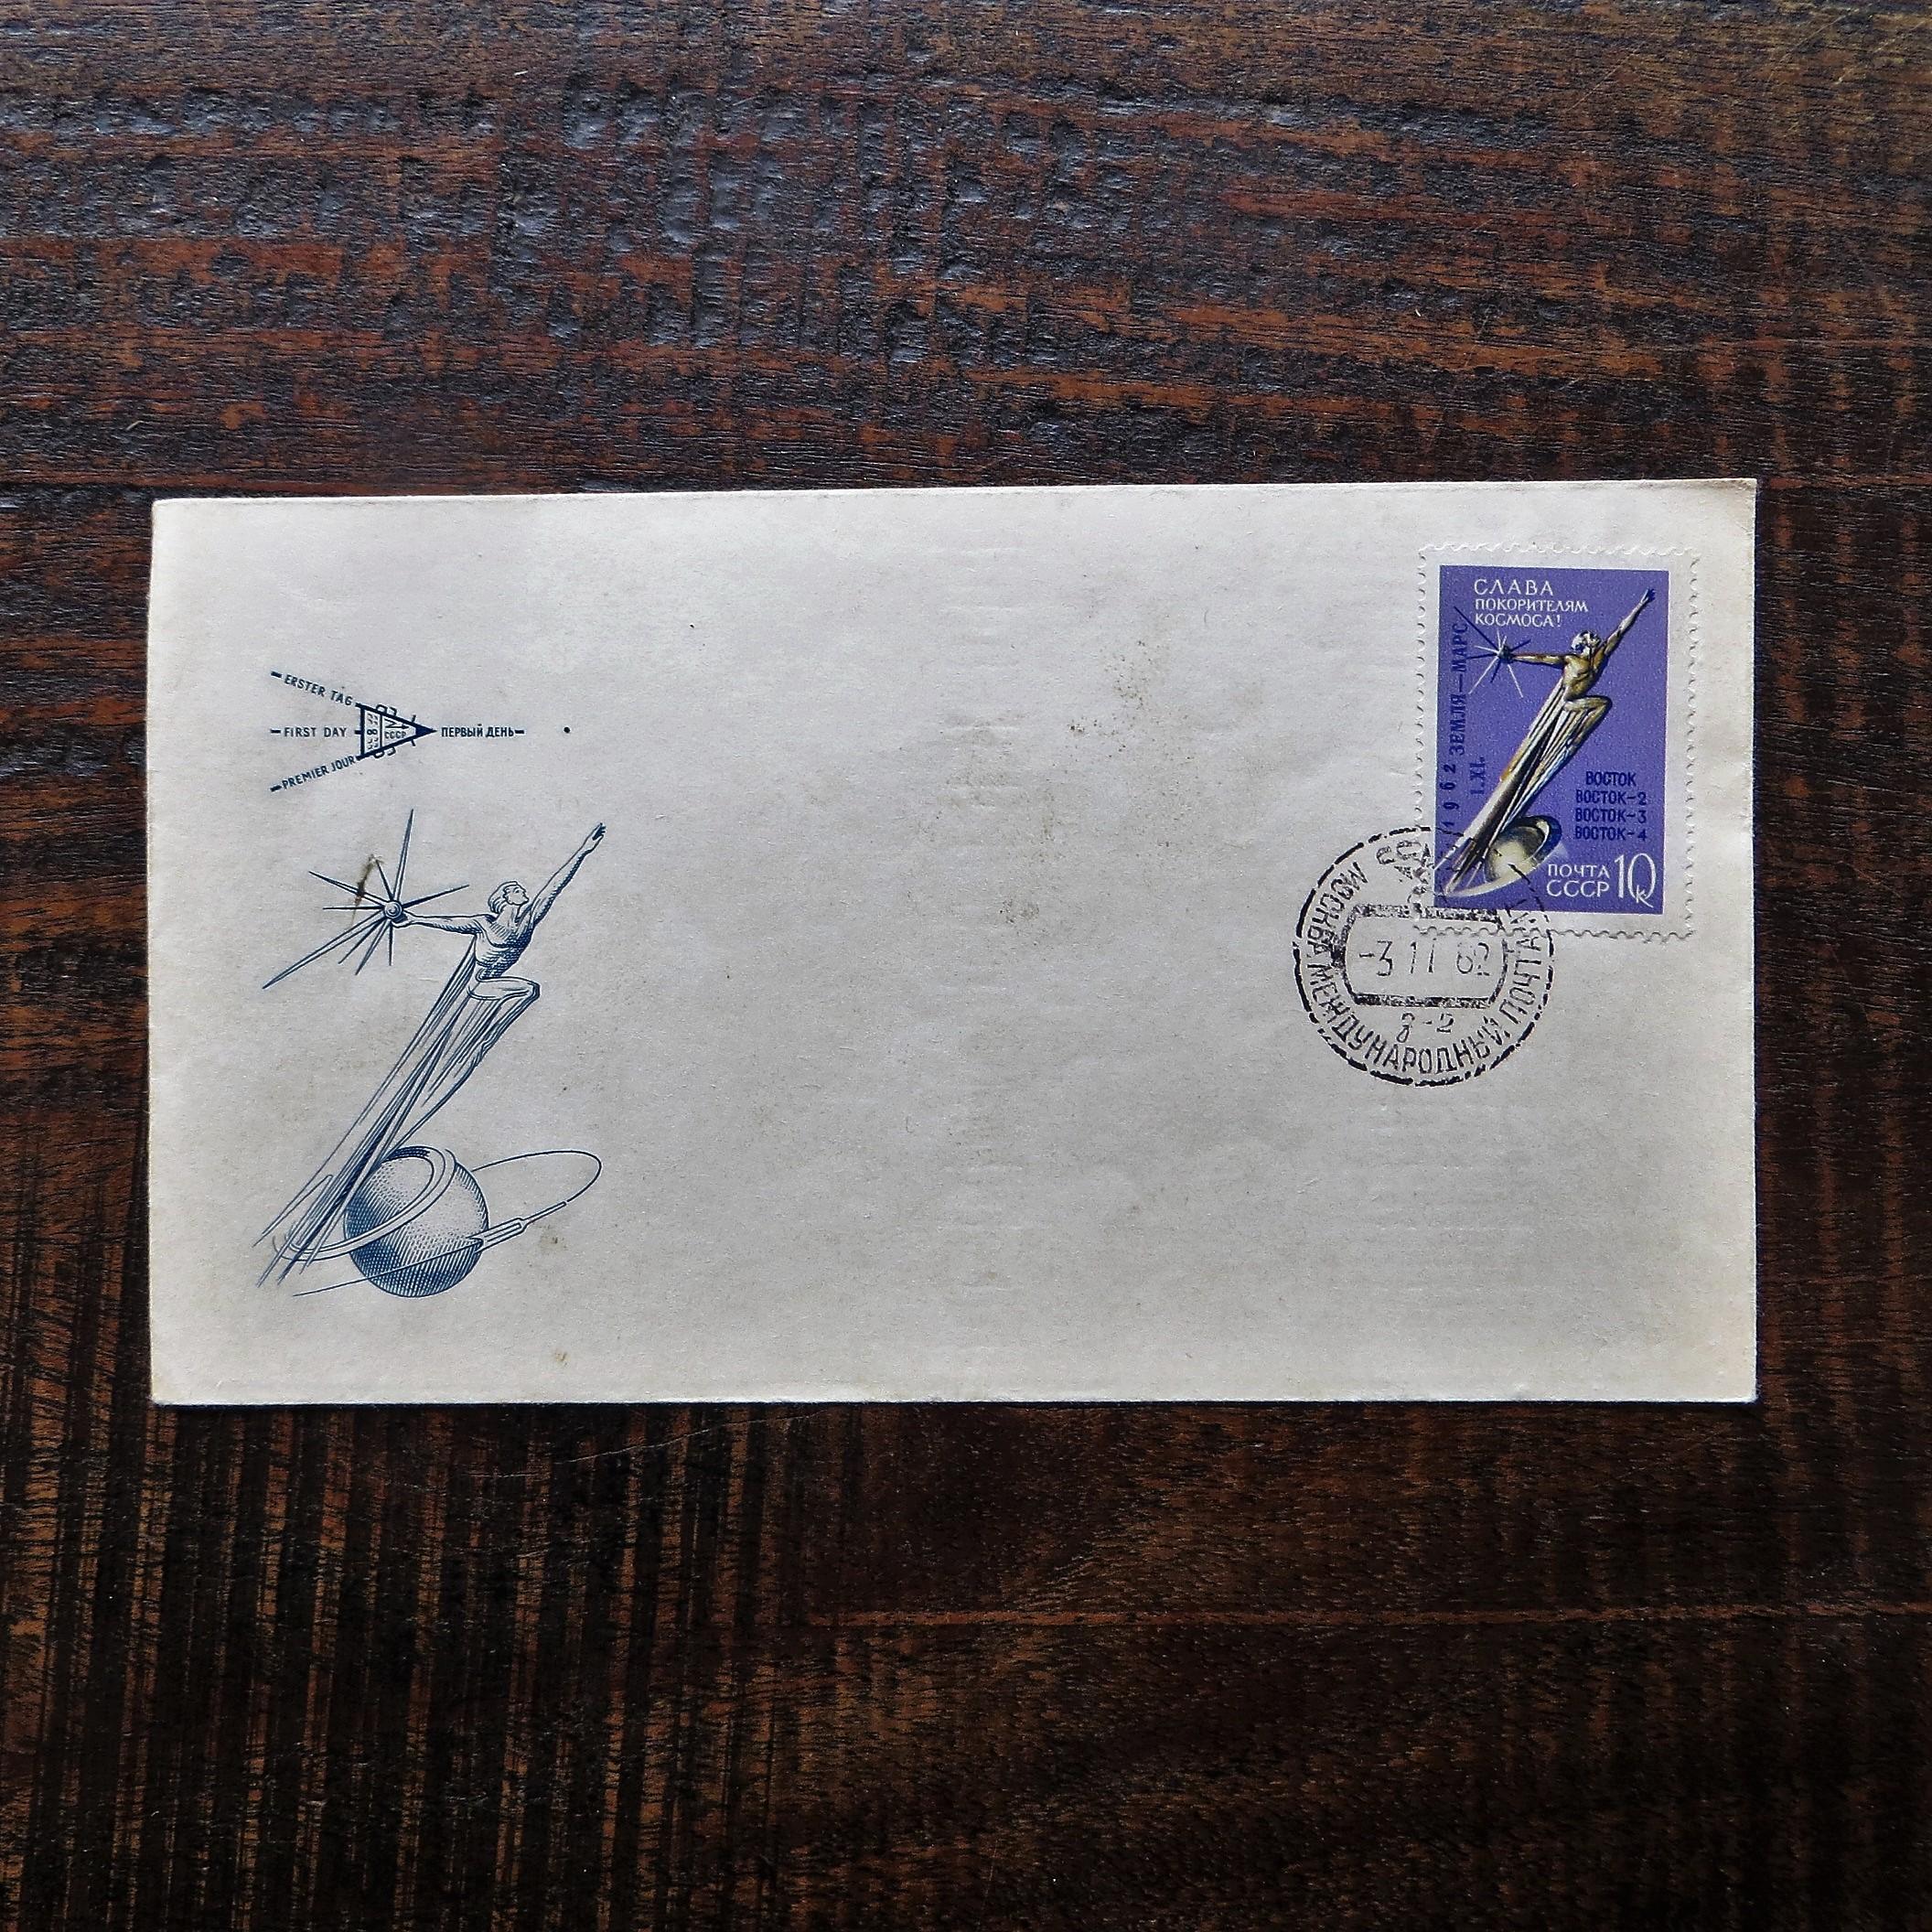 fdc-soviet-union-space-1-1